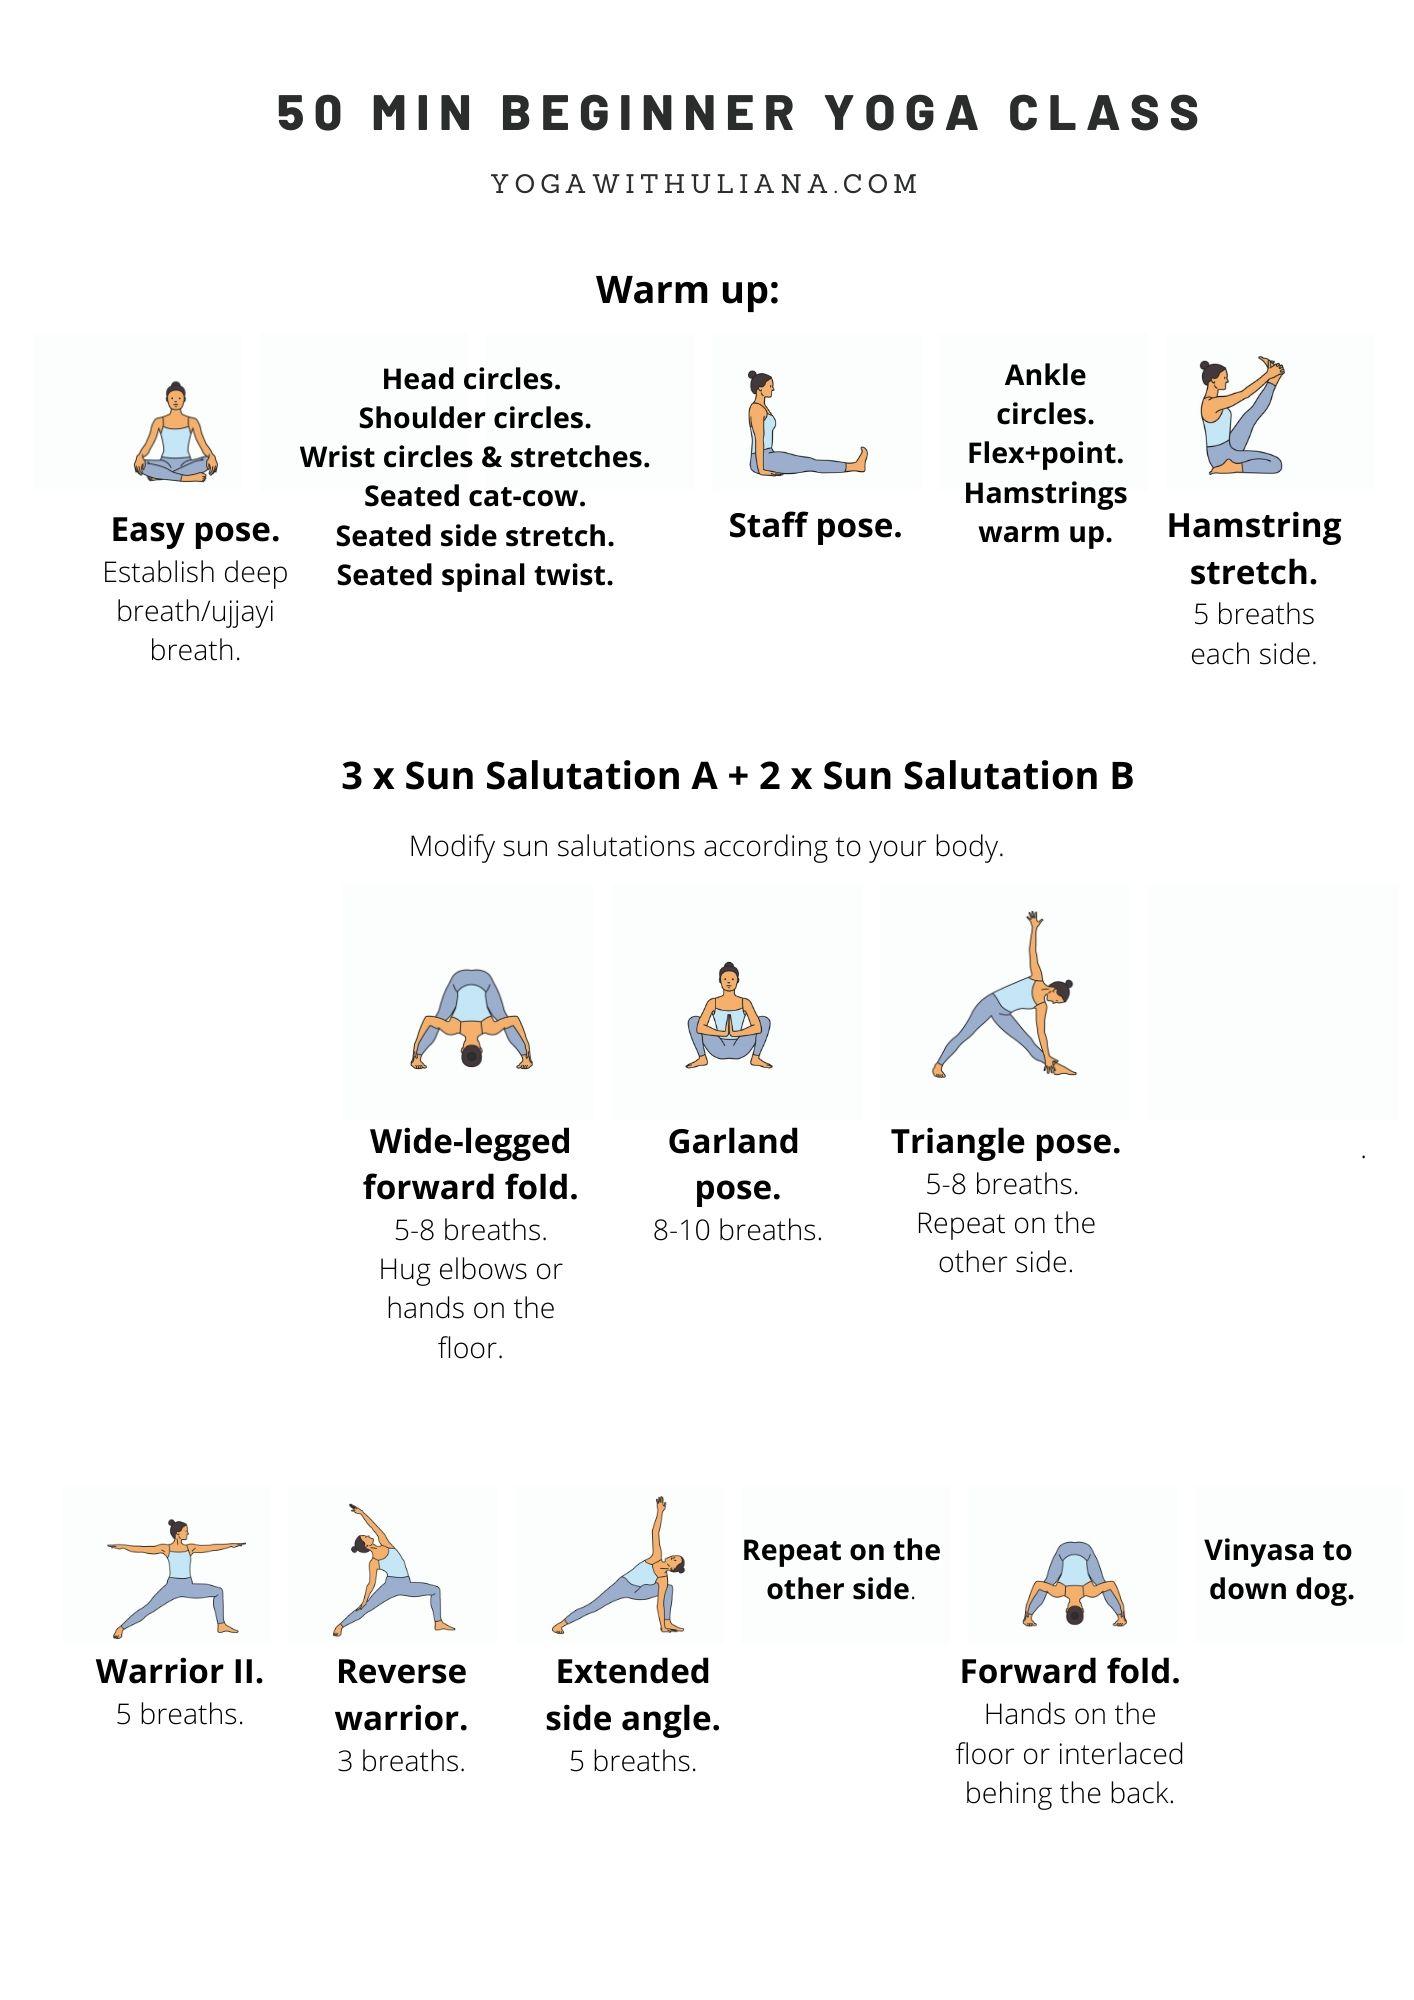 50 min beginner yoga class printable